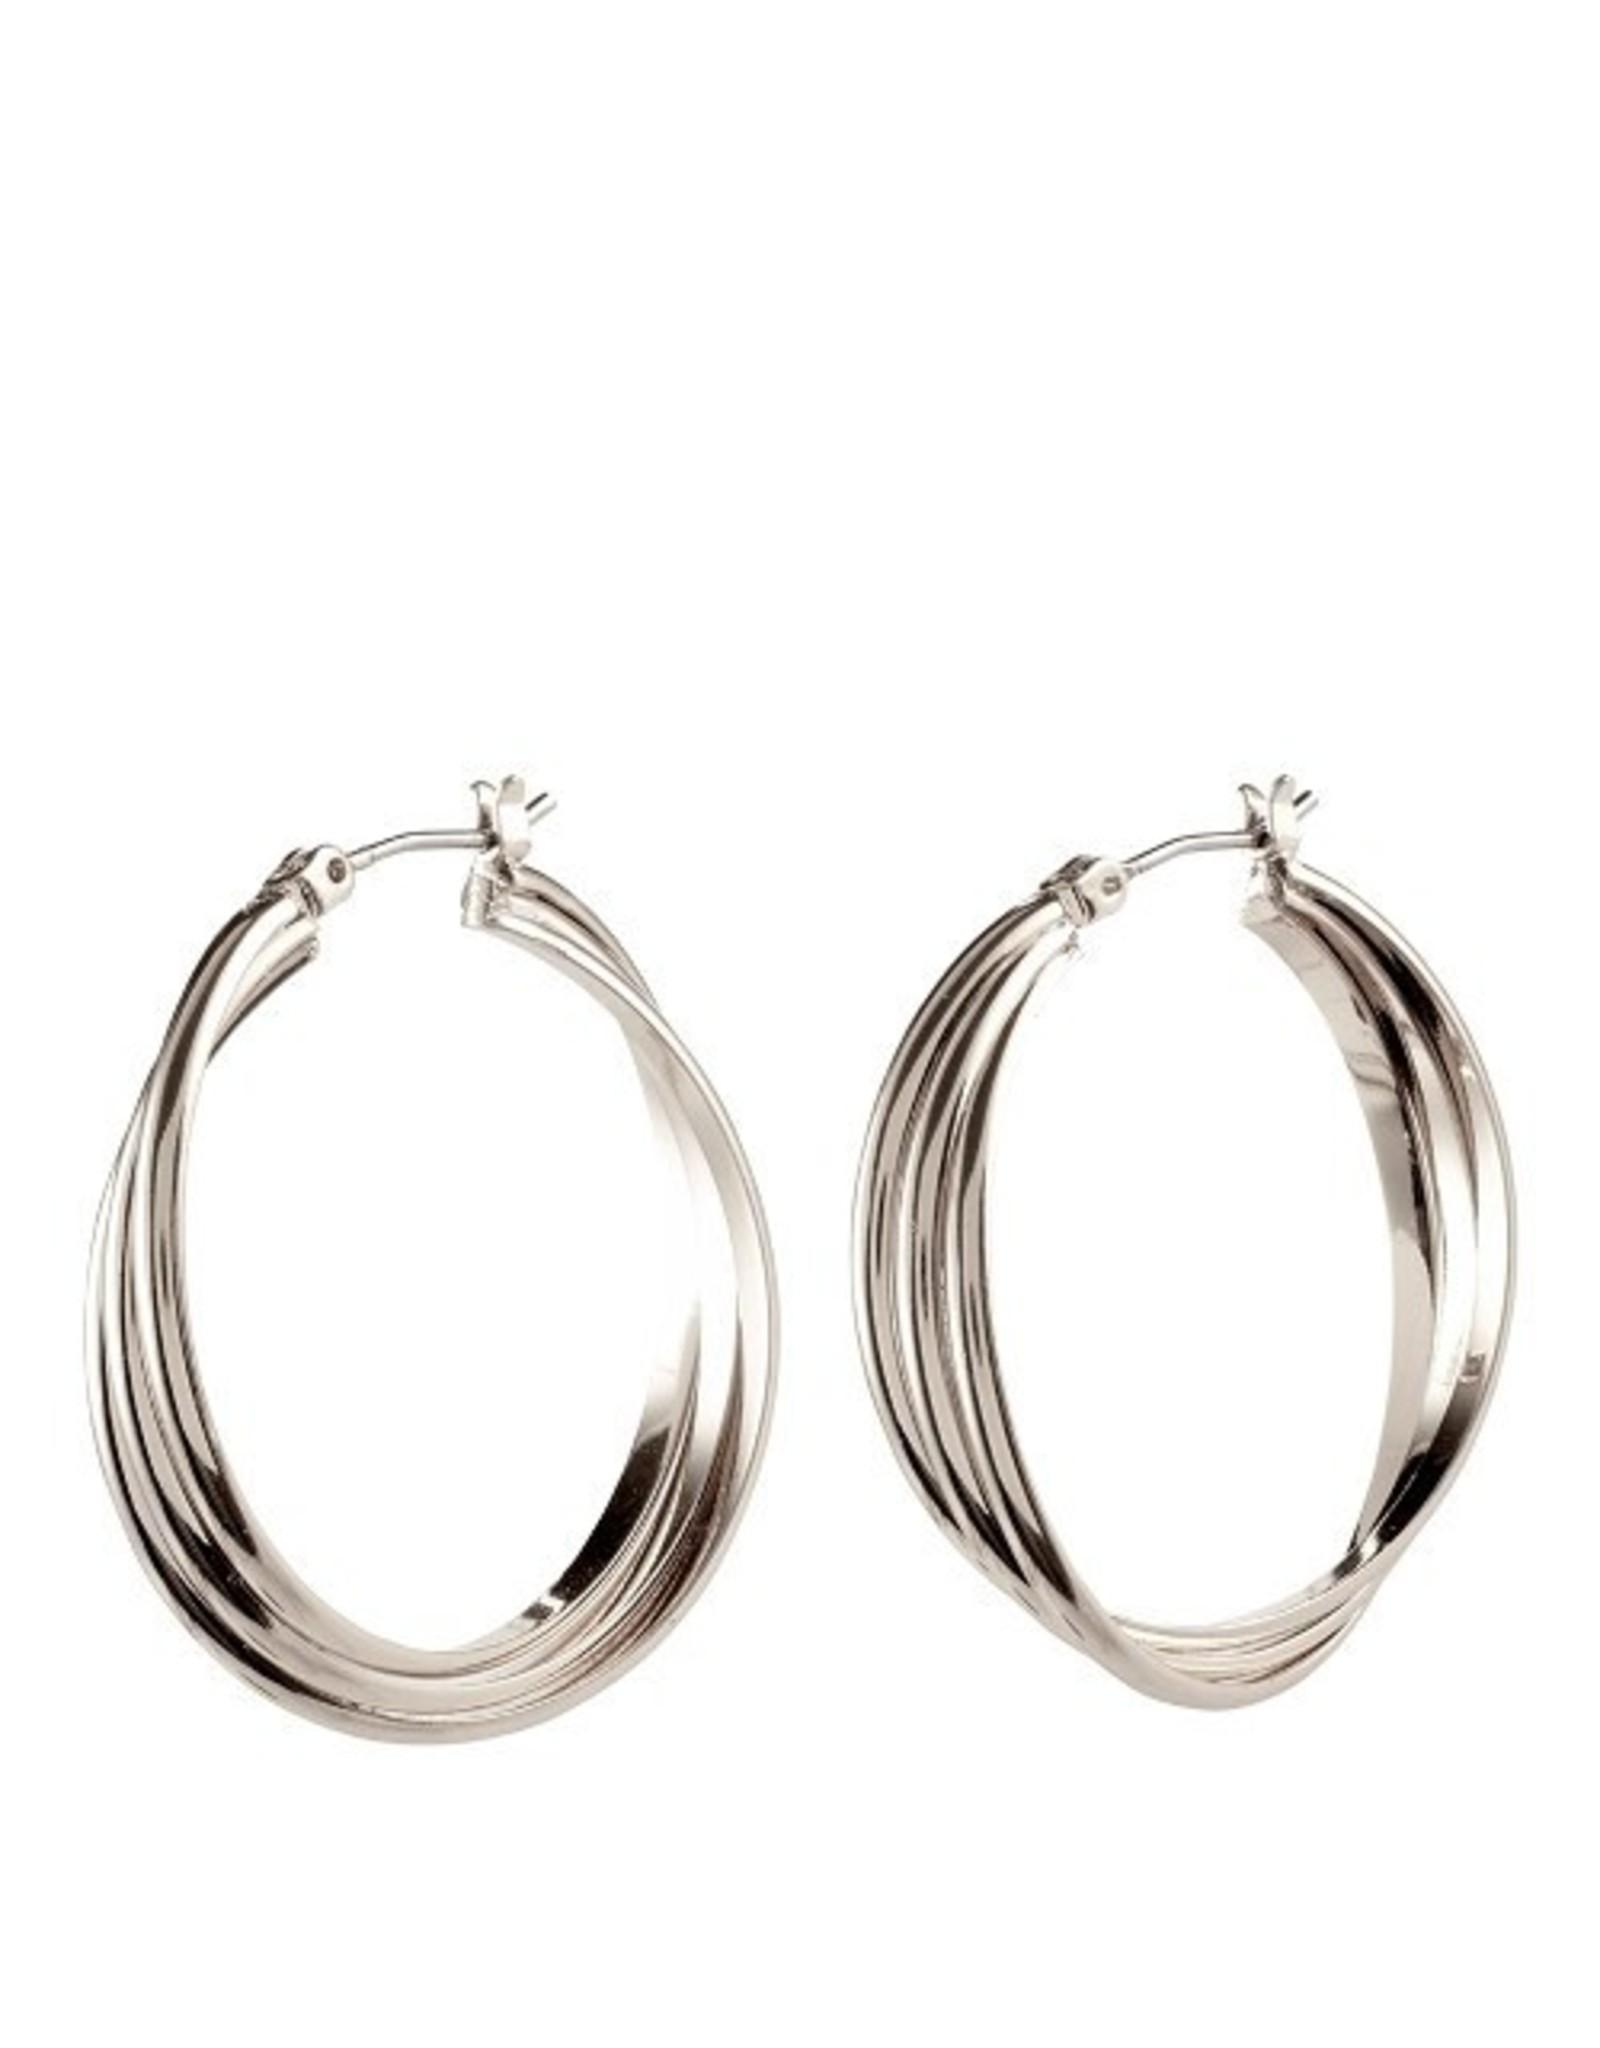 Pilgrim Pilgrim Earrings Jenifer Silver Hoops